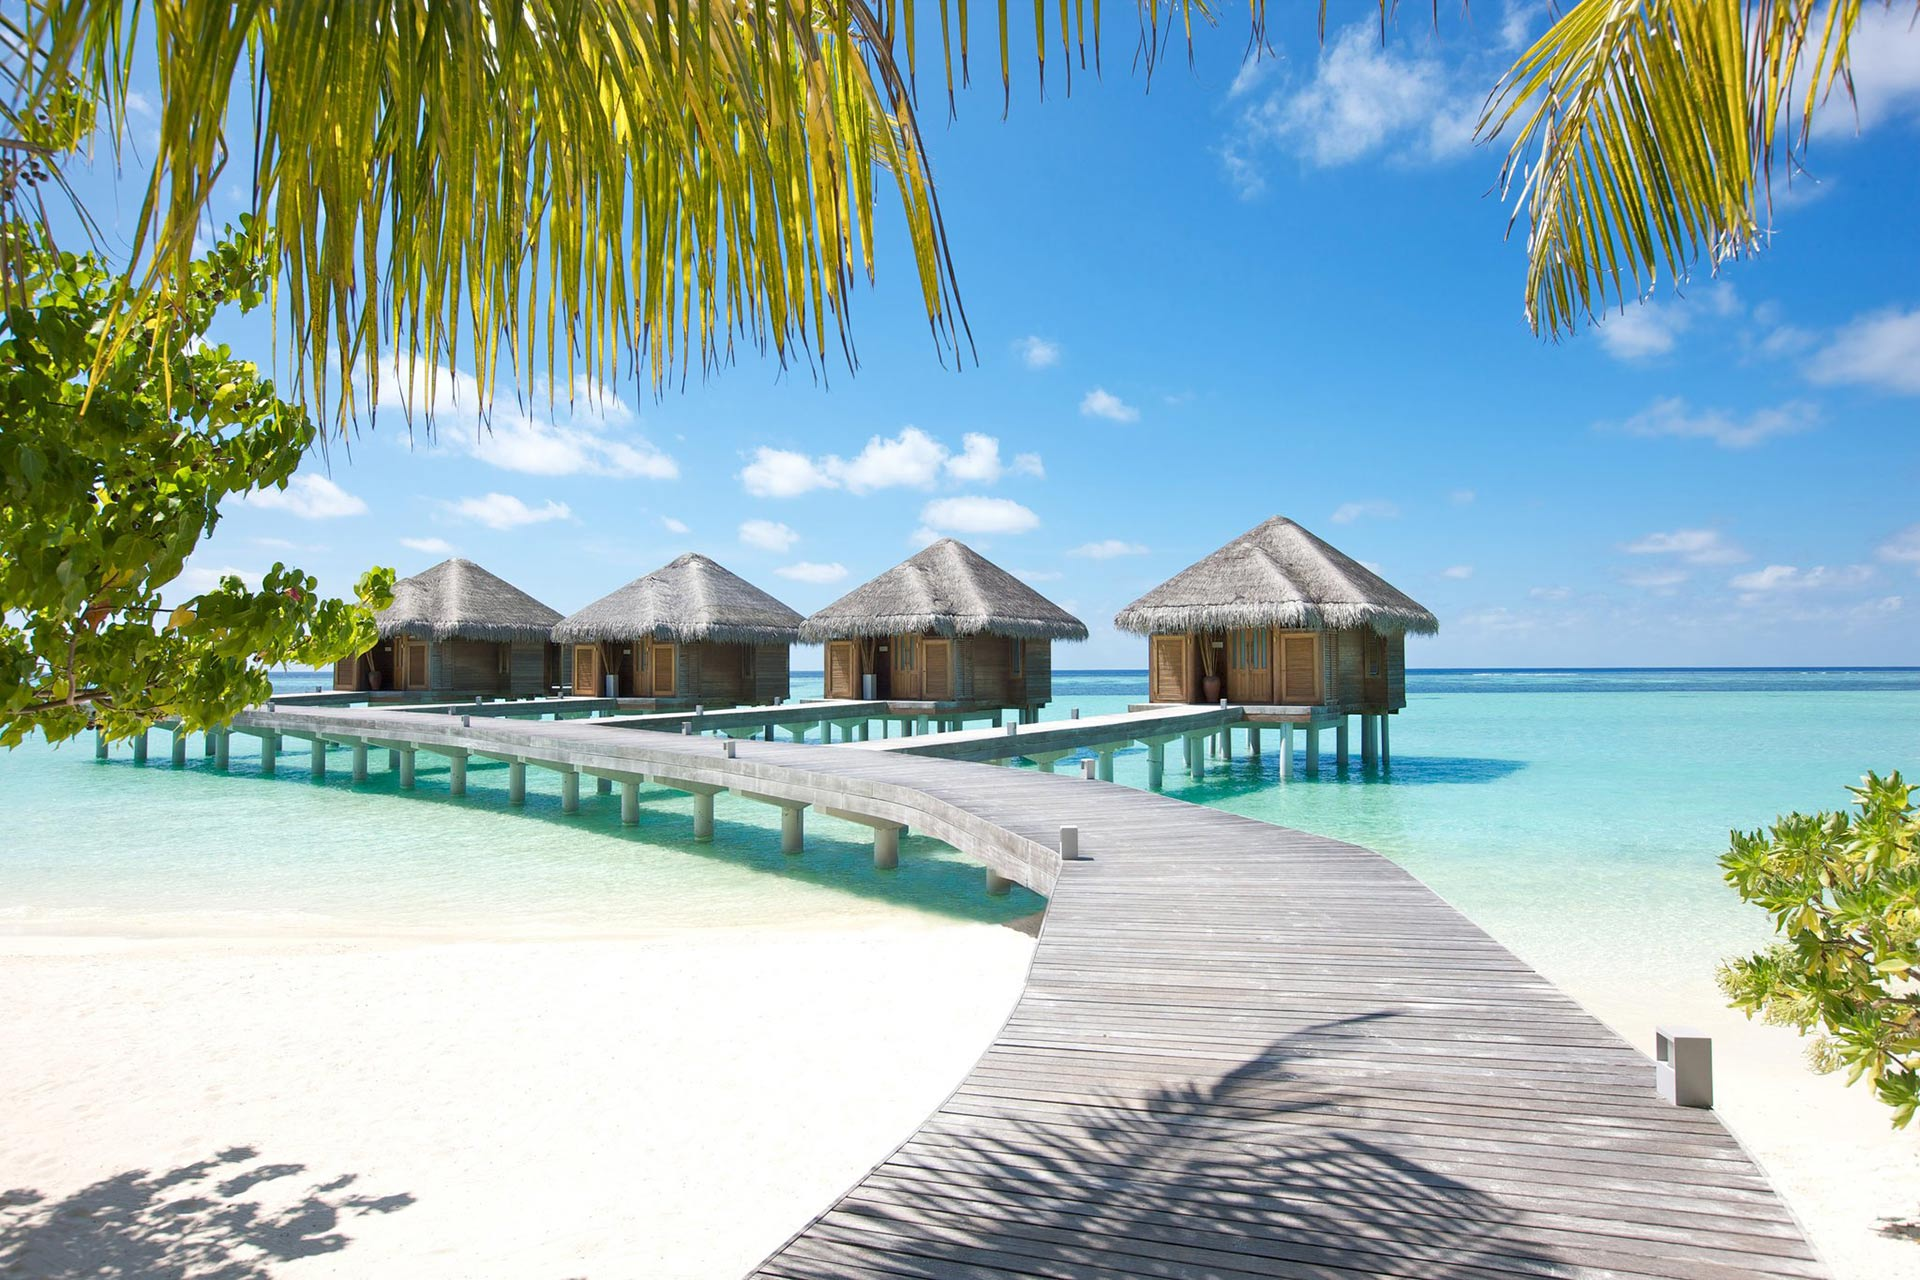 Lux* South Ari Atoll Resort in the Maldives; Courtesy of Lux* South Ari Atoll Resort